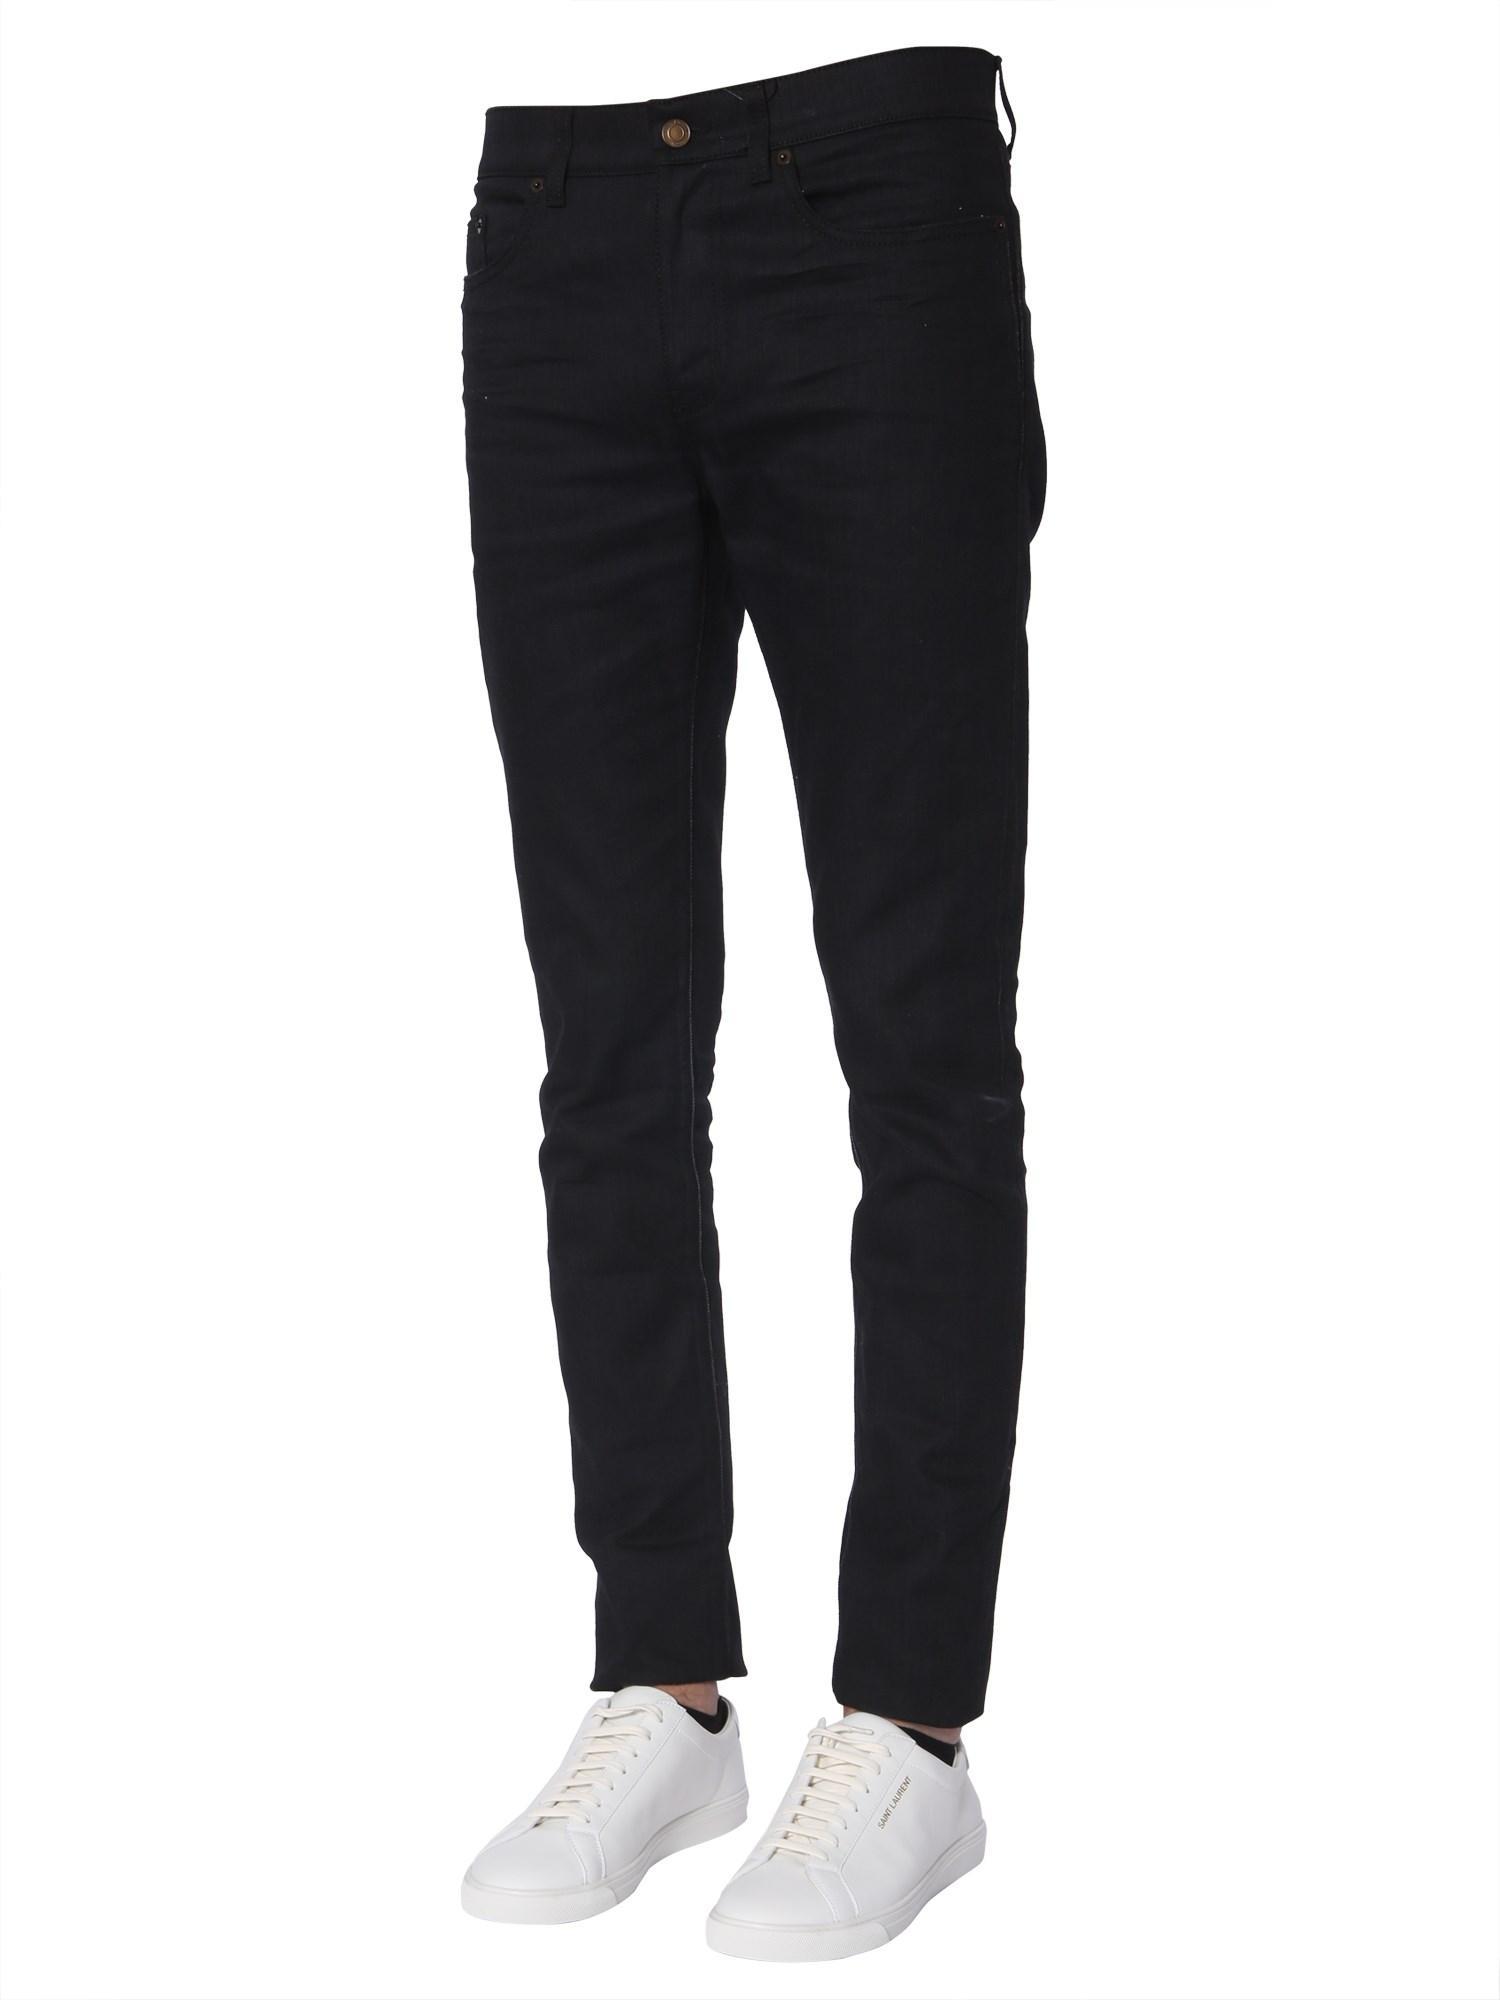 b033fab327d Lyst - Saint Laurent Low Waist Skinny Jeans In Denim in Black for Men